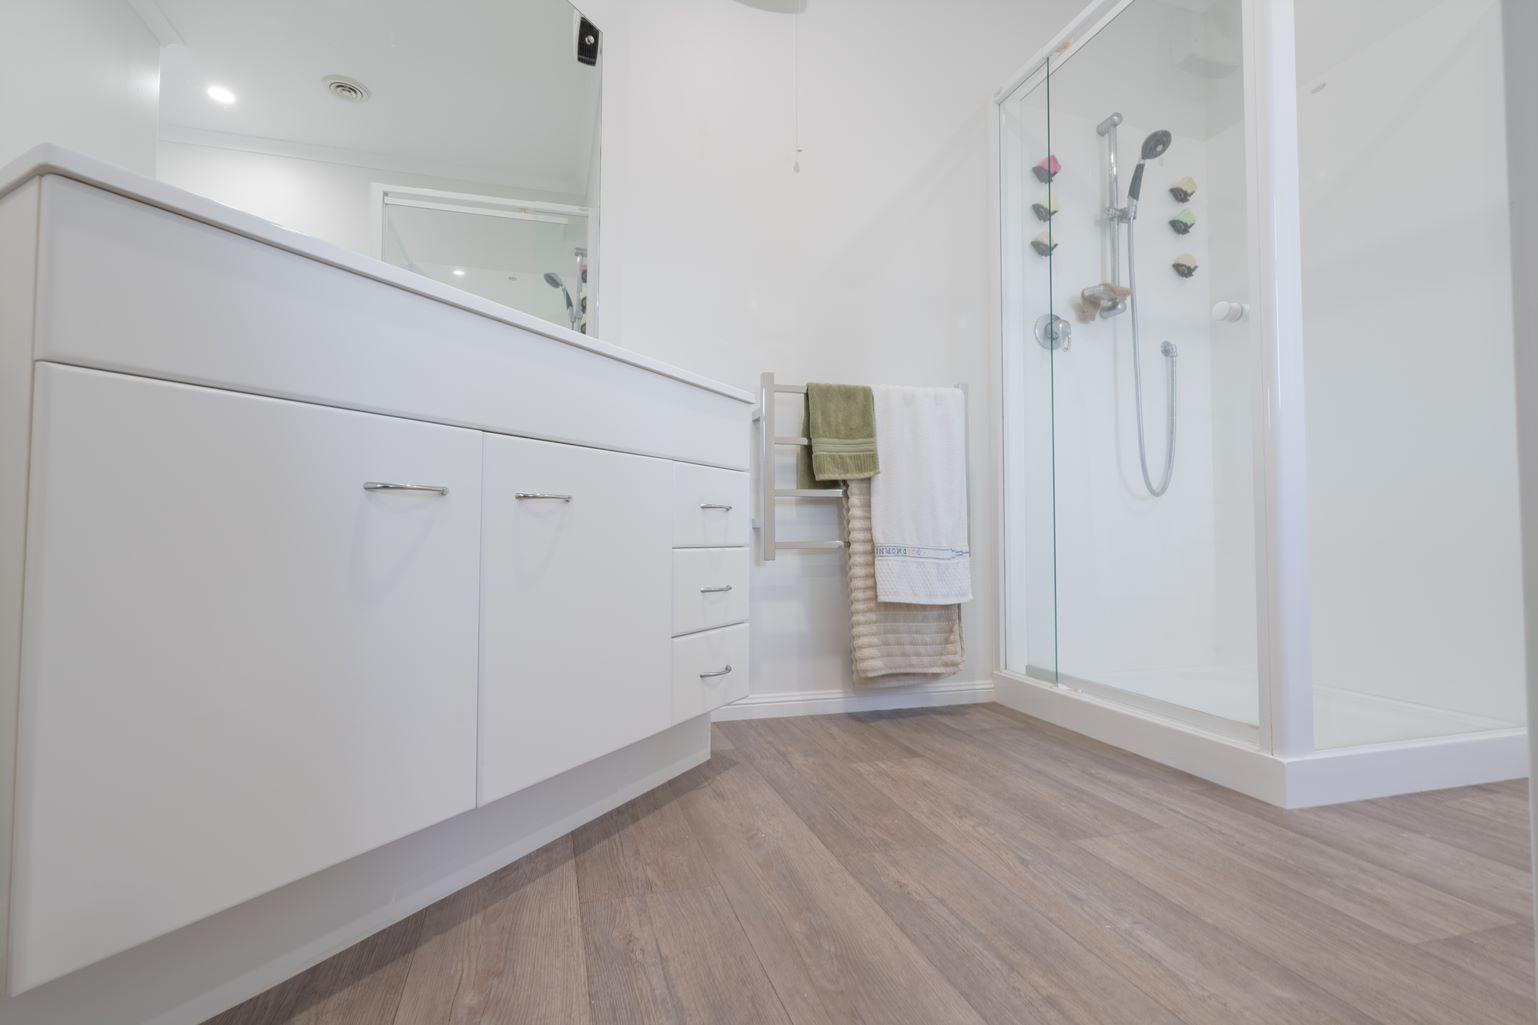 vinyl flooring in bathroom - beach house renovation